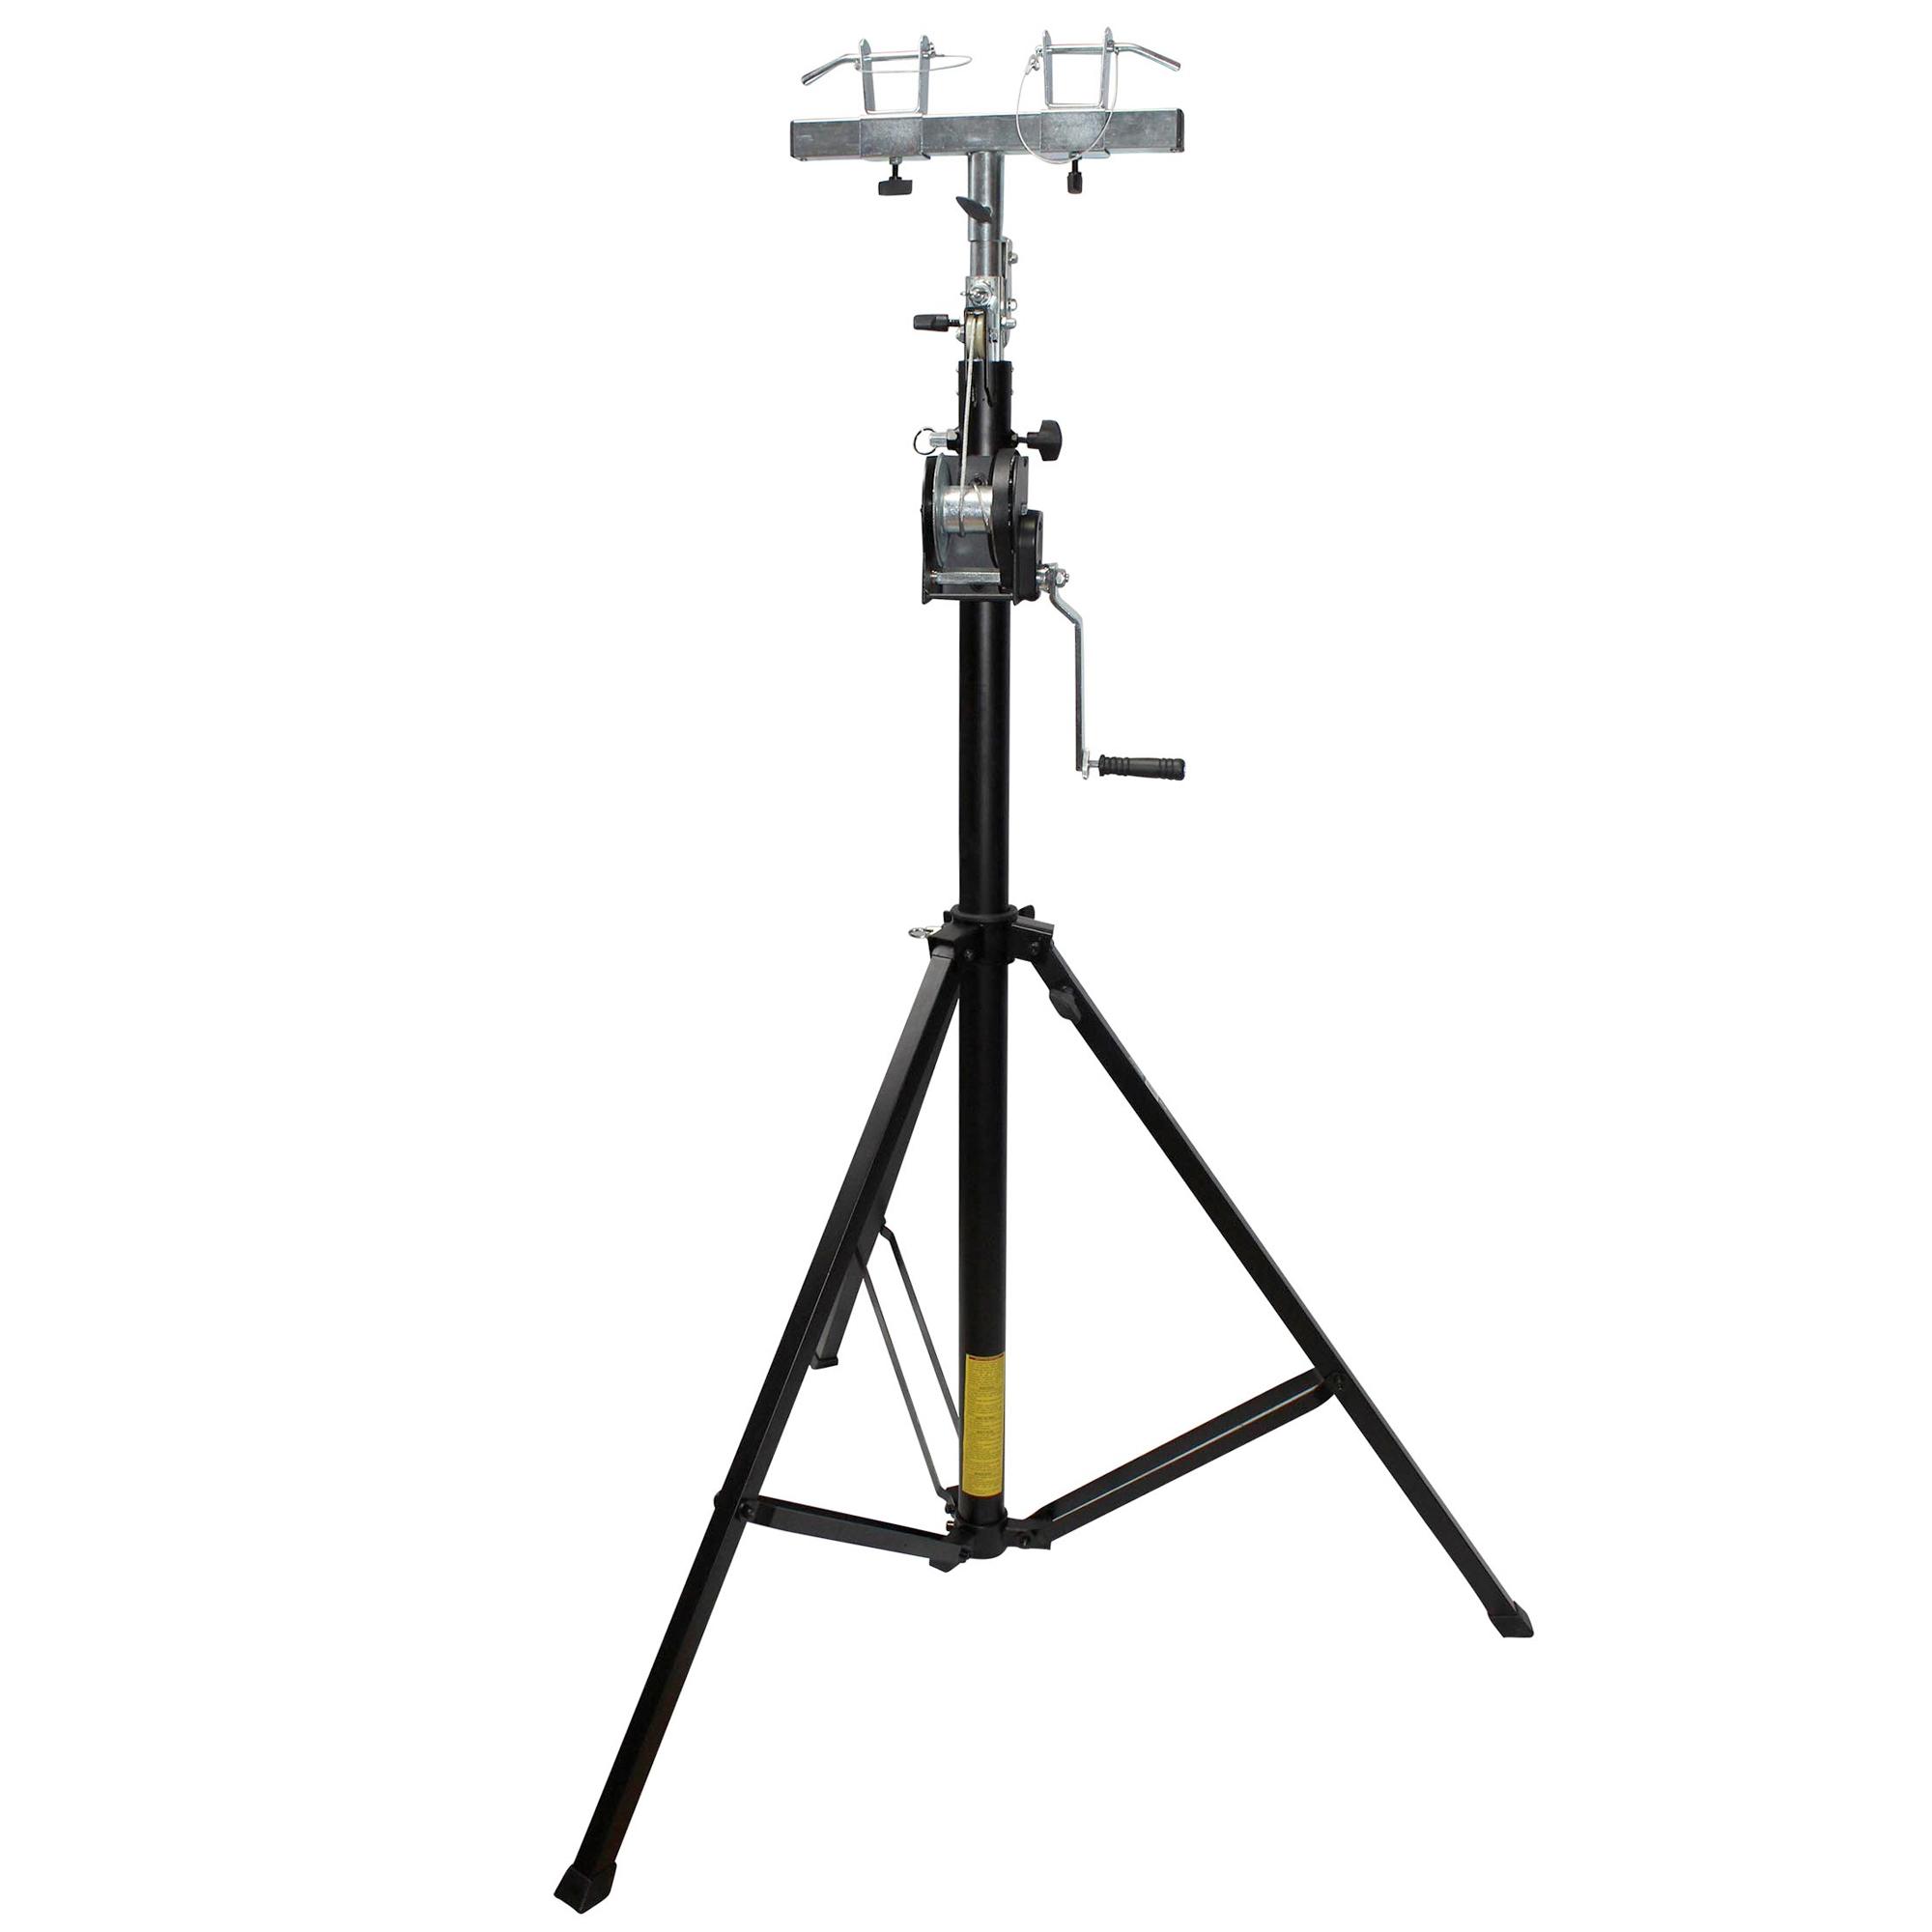 Prox Xt Ls132 Lighting Crank Truss Stand 200lb Capacity